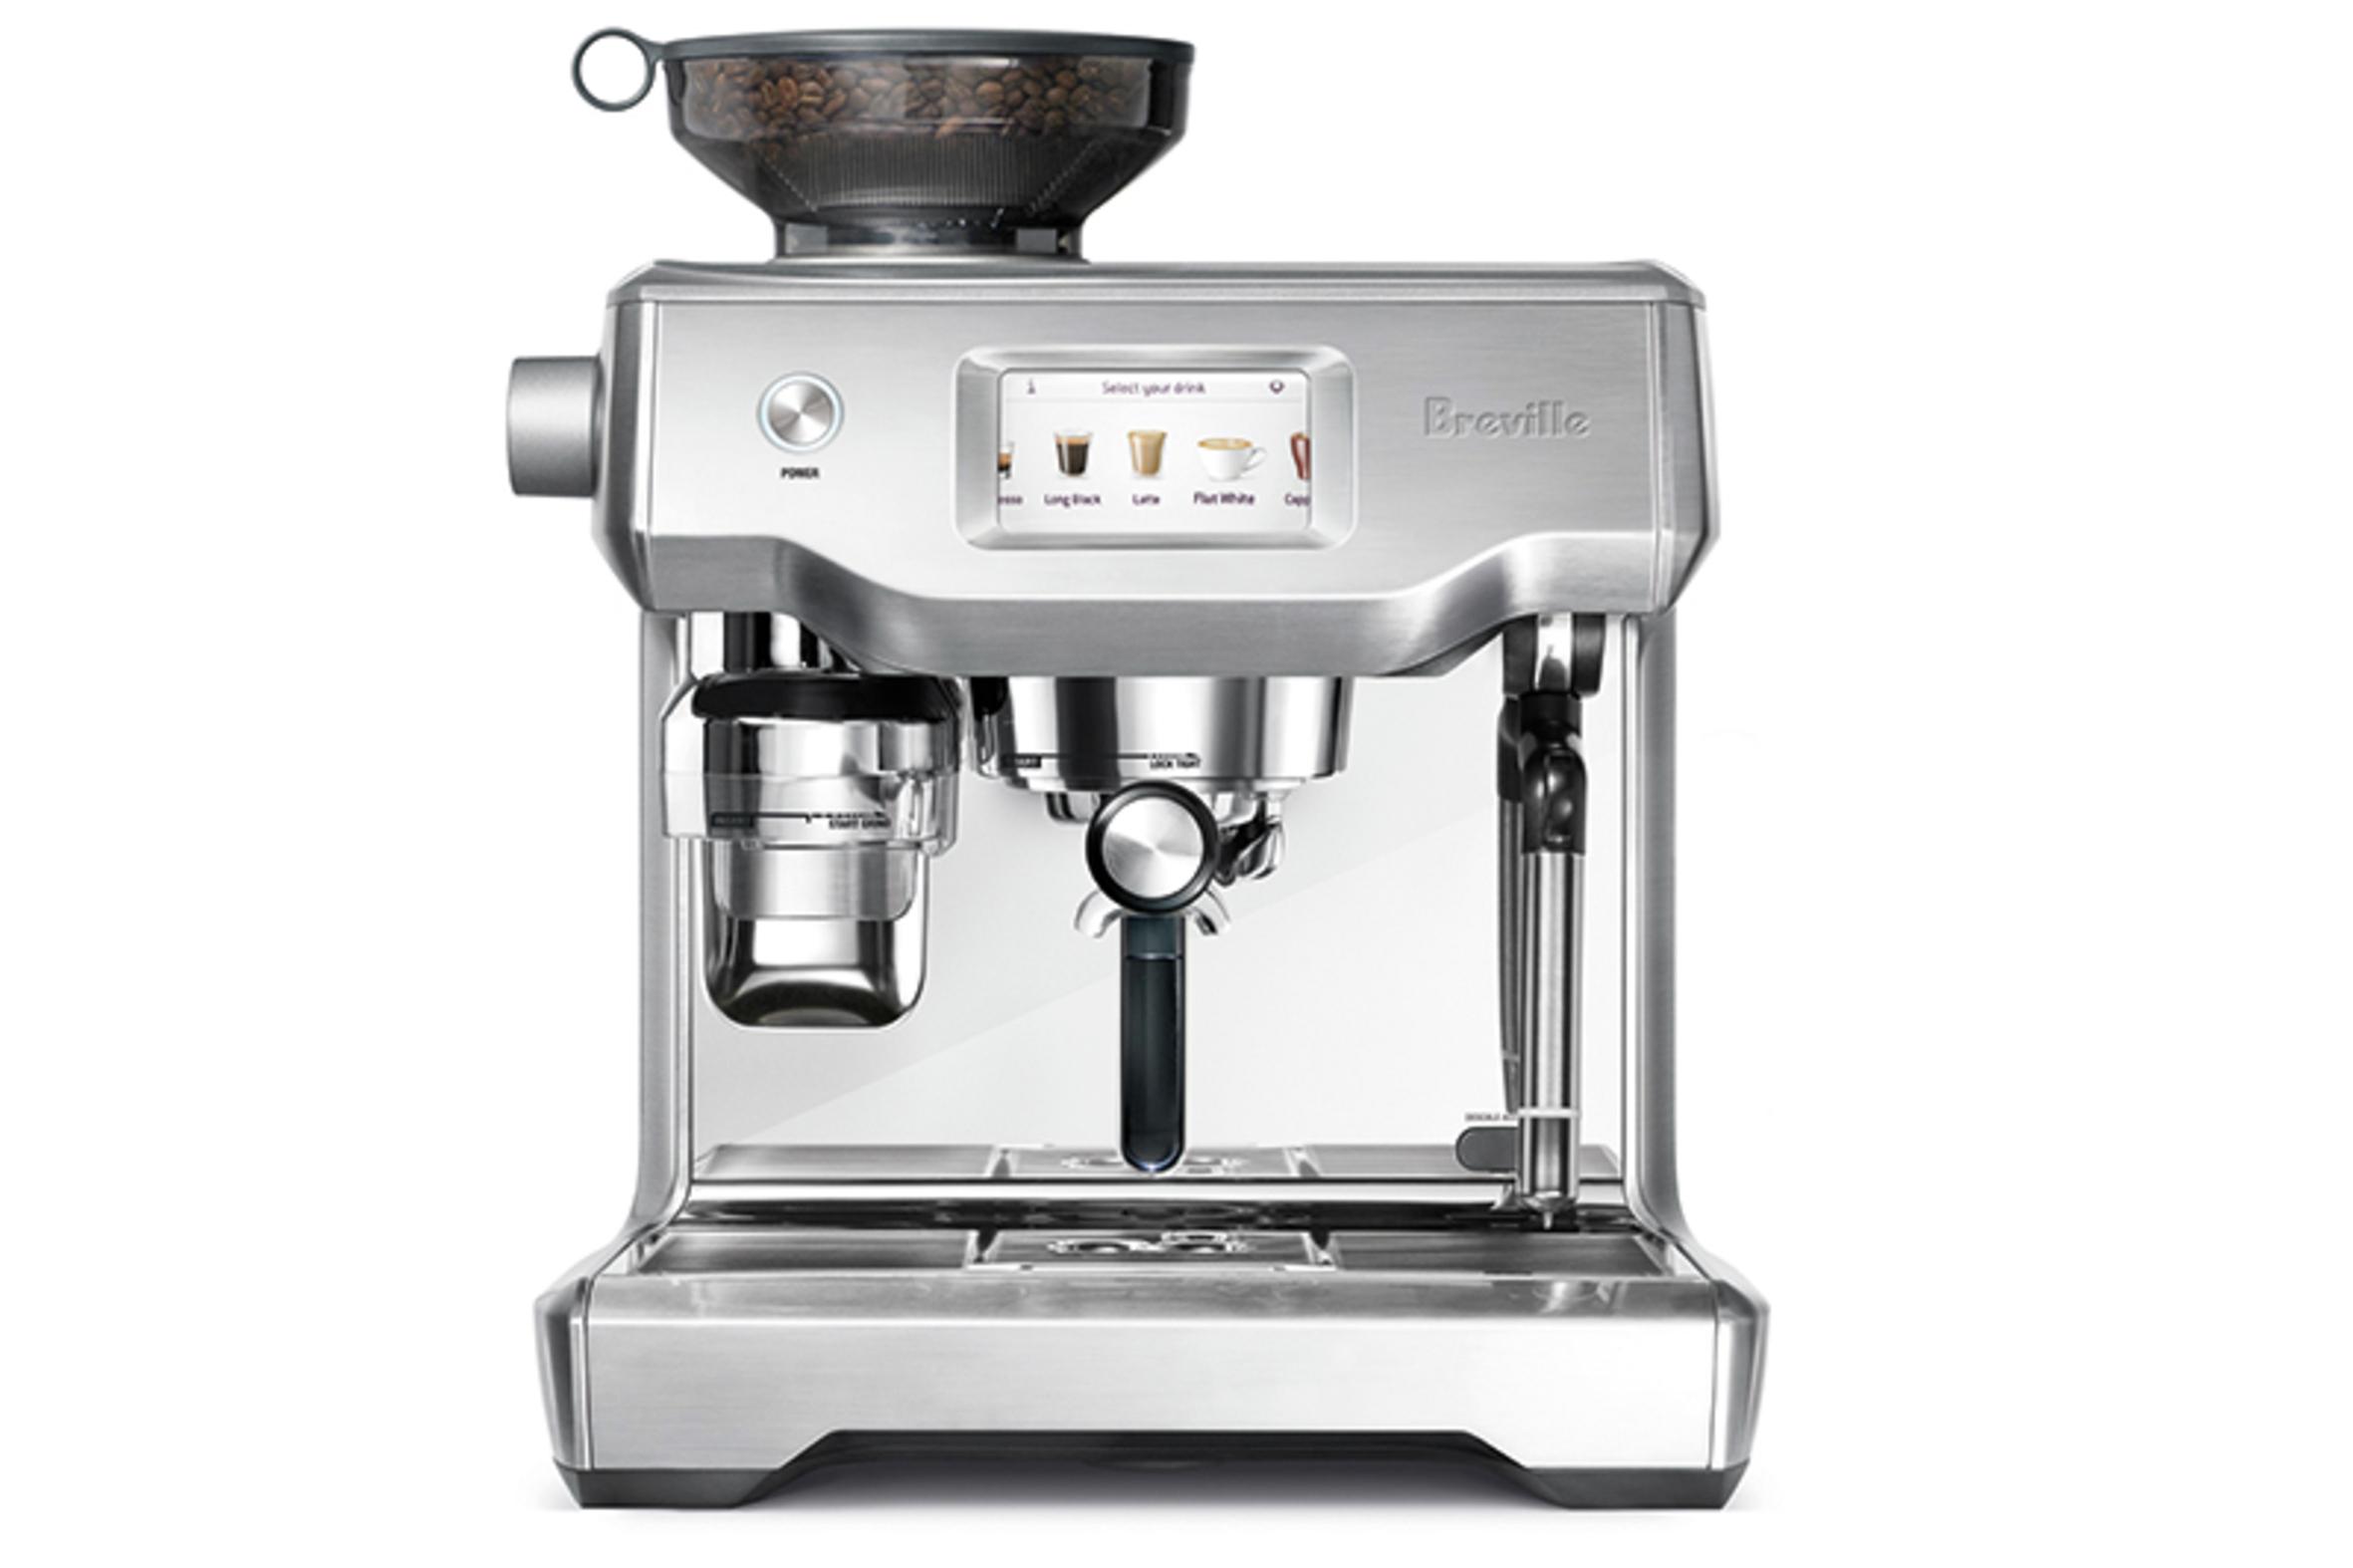 Breville Introduces Next Generation Automatic Espresso Machine